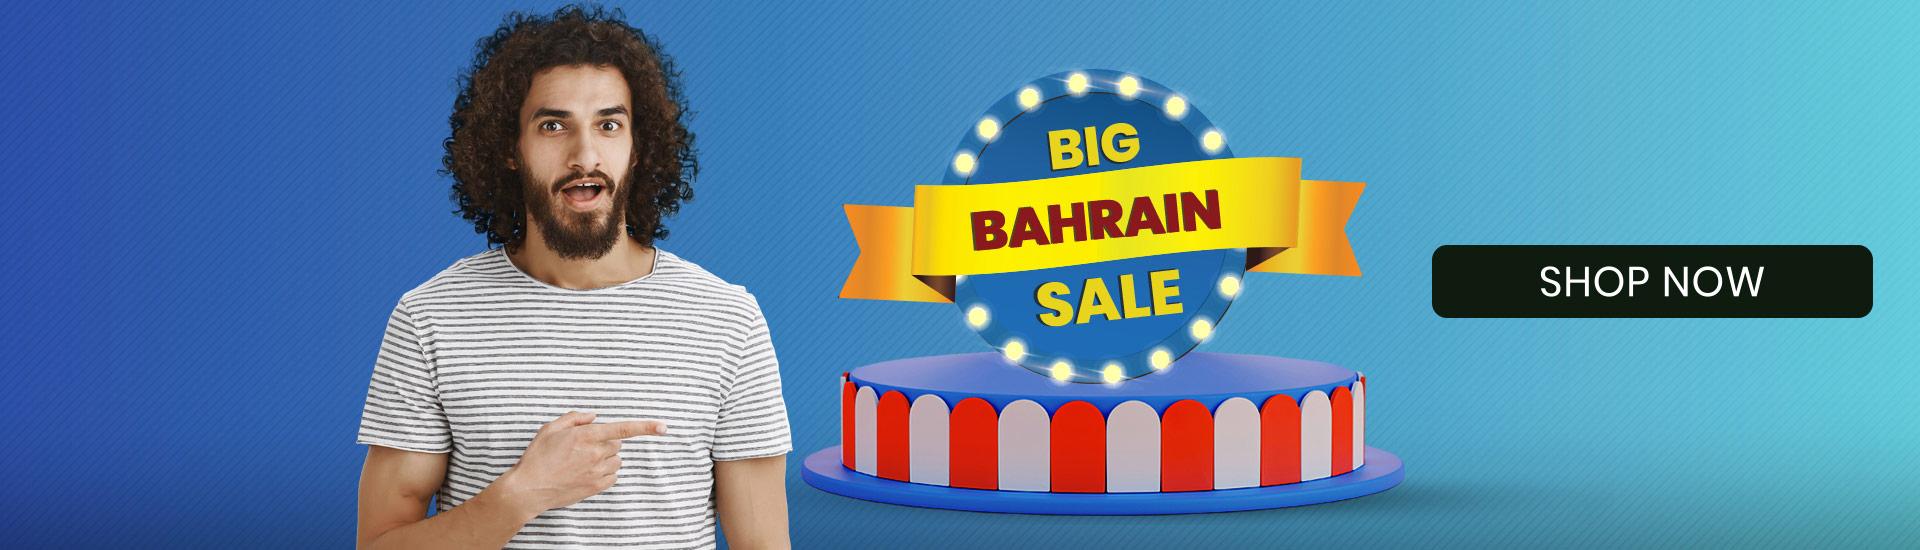 bahrain.ourshopee.com